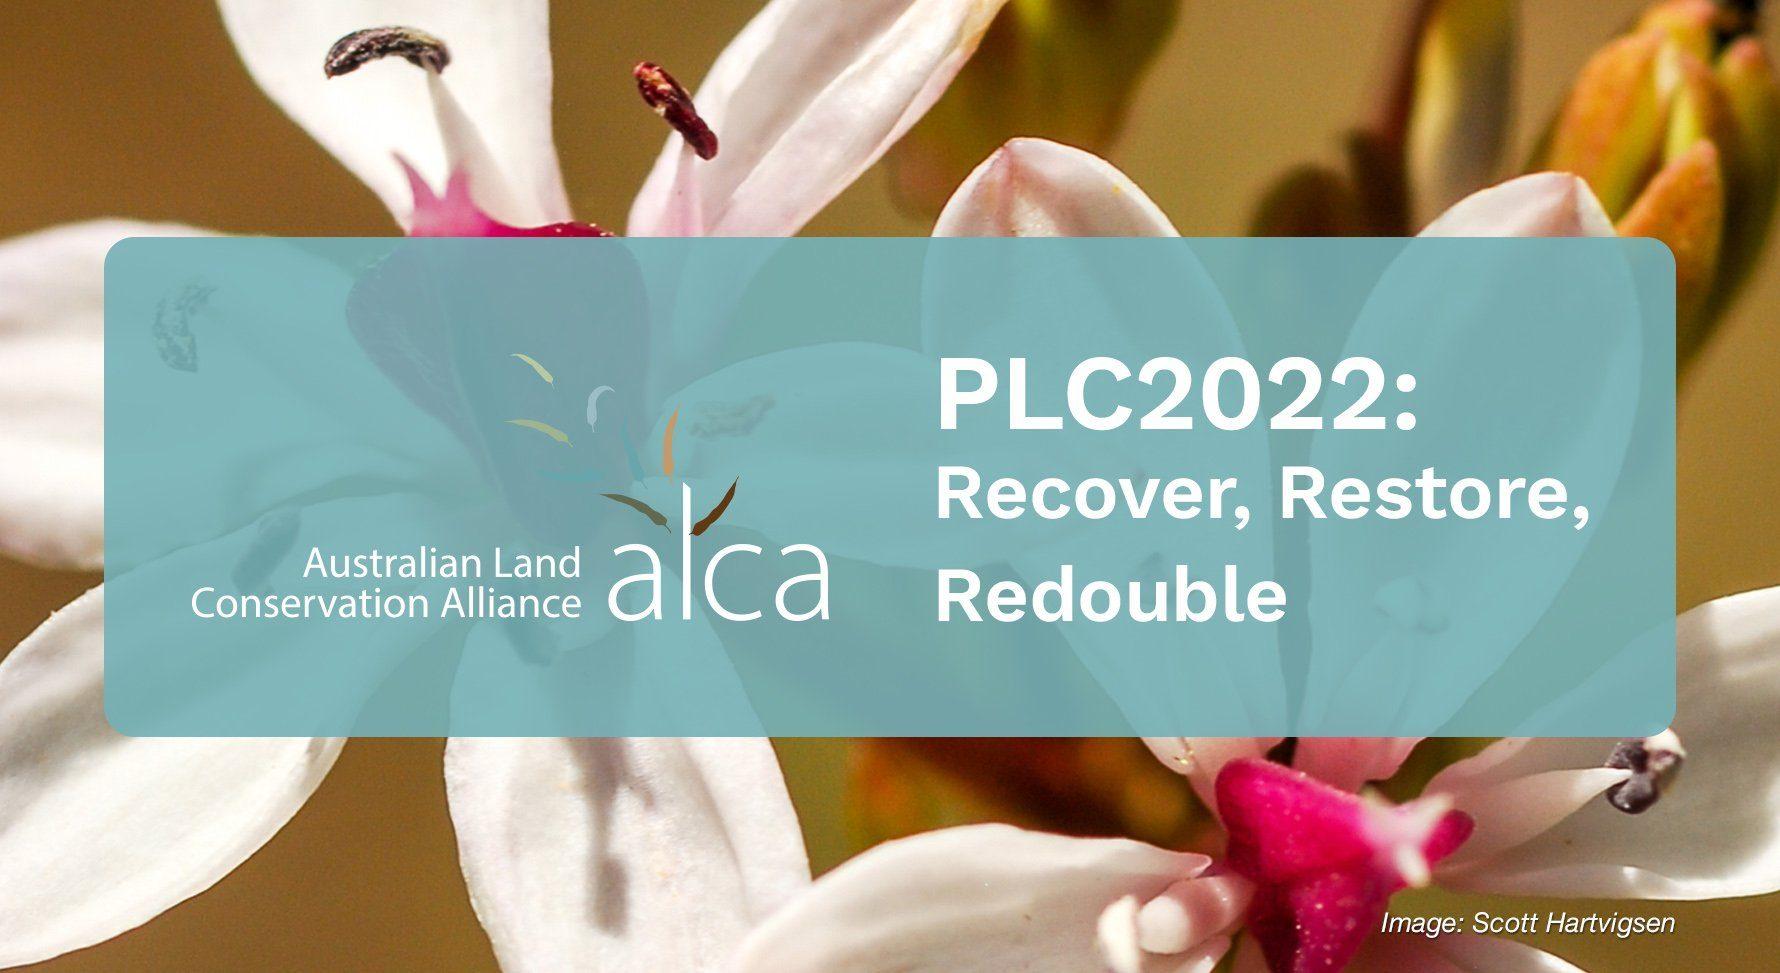 ALCA_PLC2022_website_image_1780x976px_2